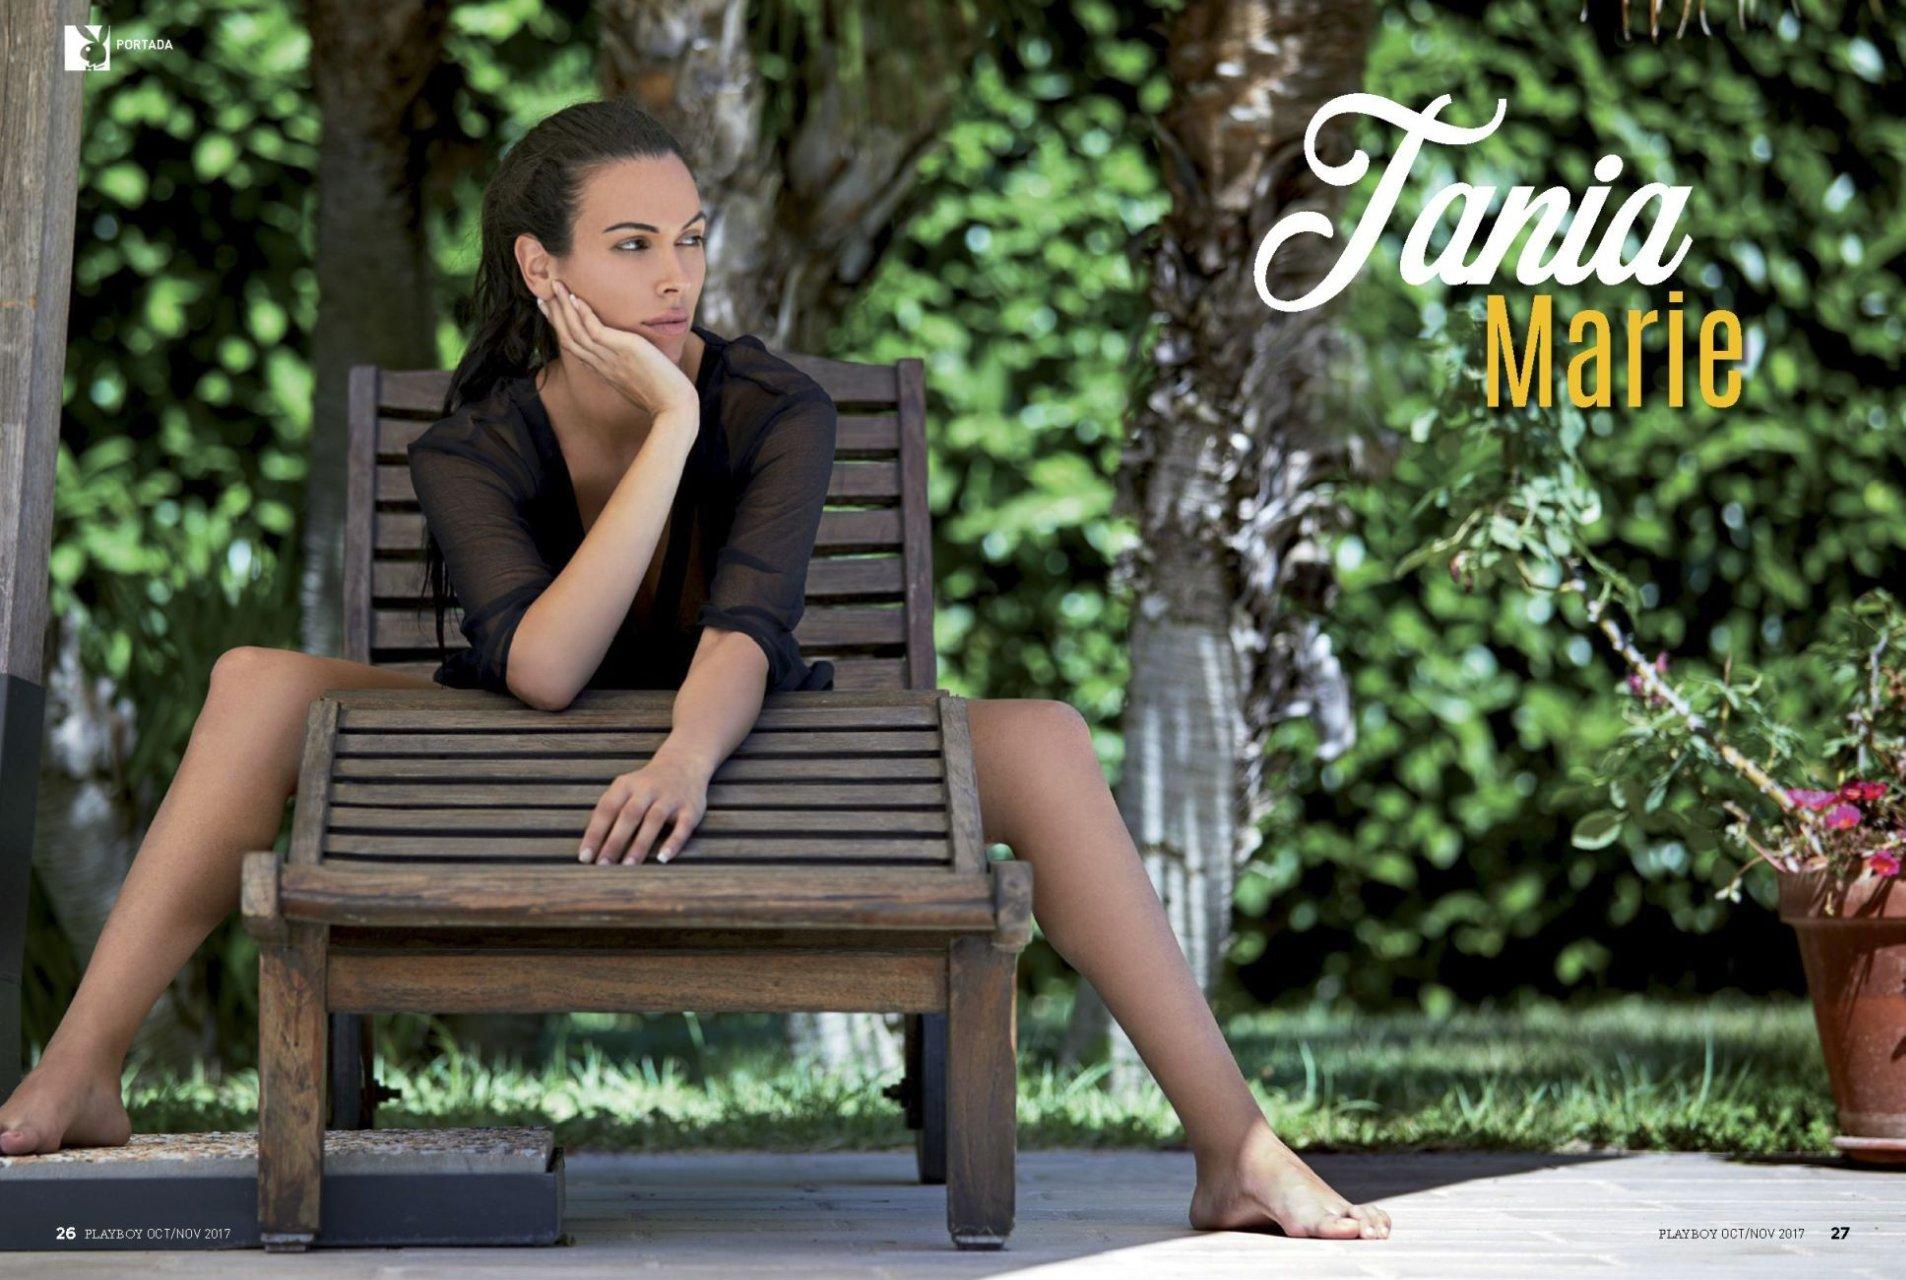 Tania maria quinones naked - 2019 year